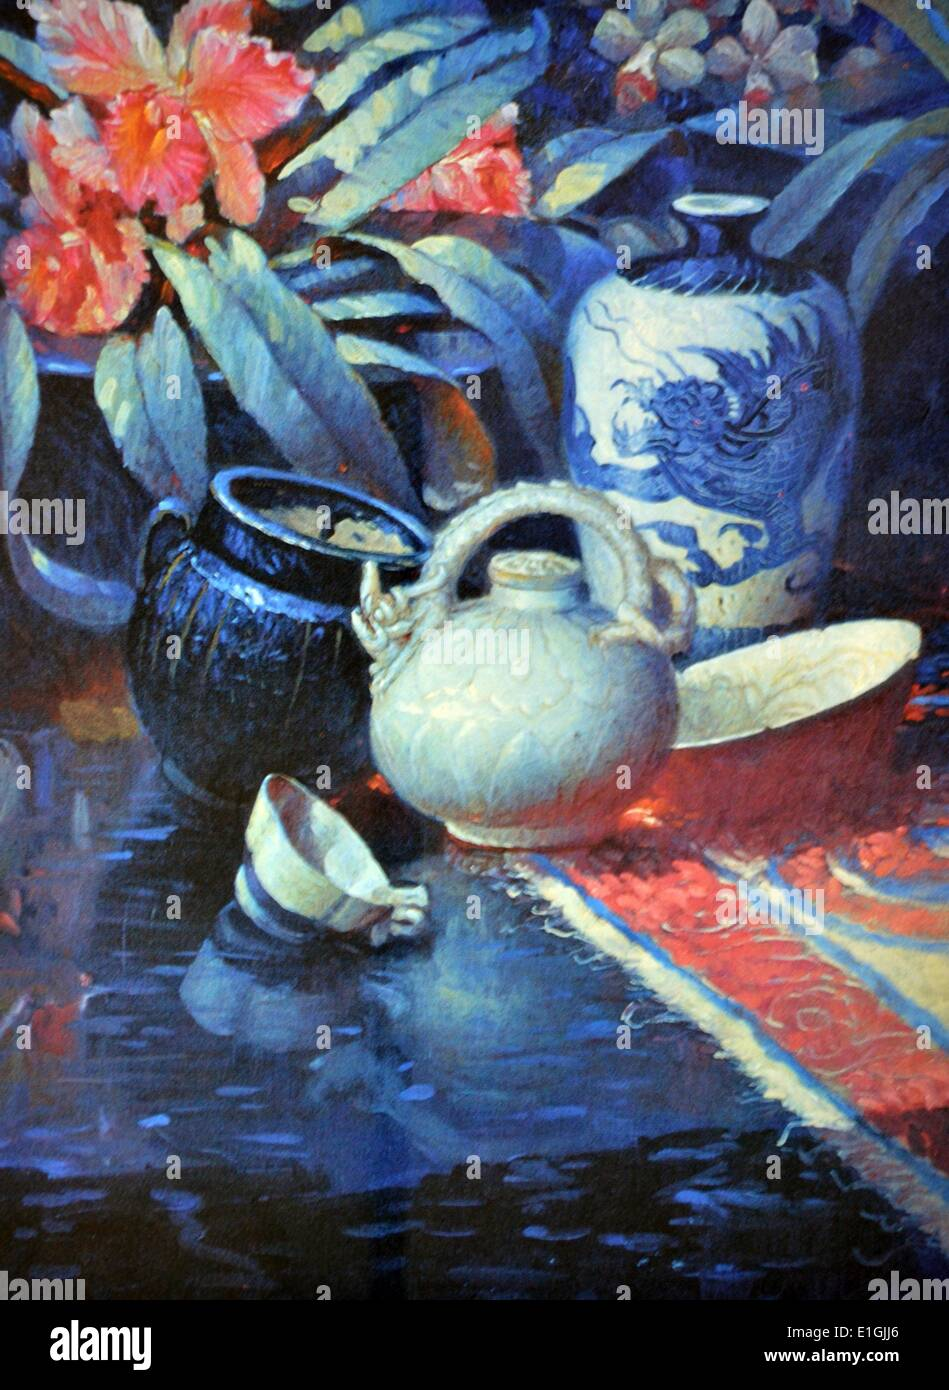 Greg Bolanos, Sung Dynasty II, 1993, Oil on canvas. - Stock Image